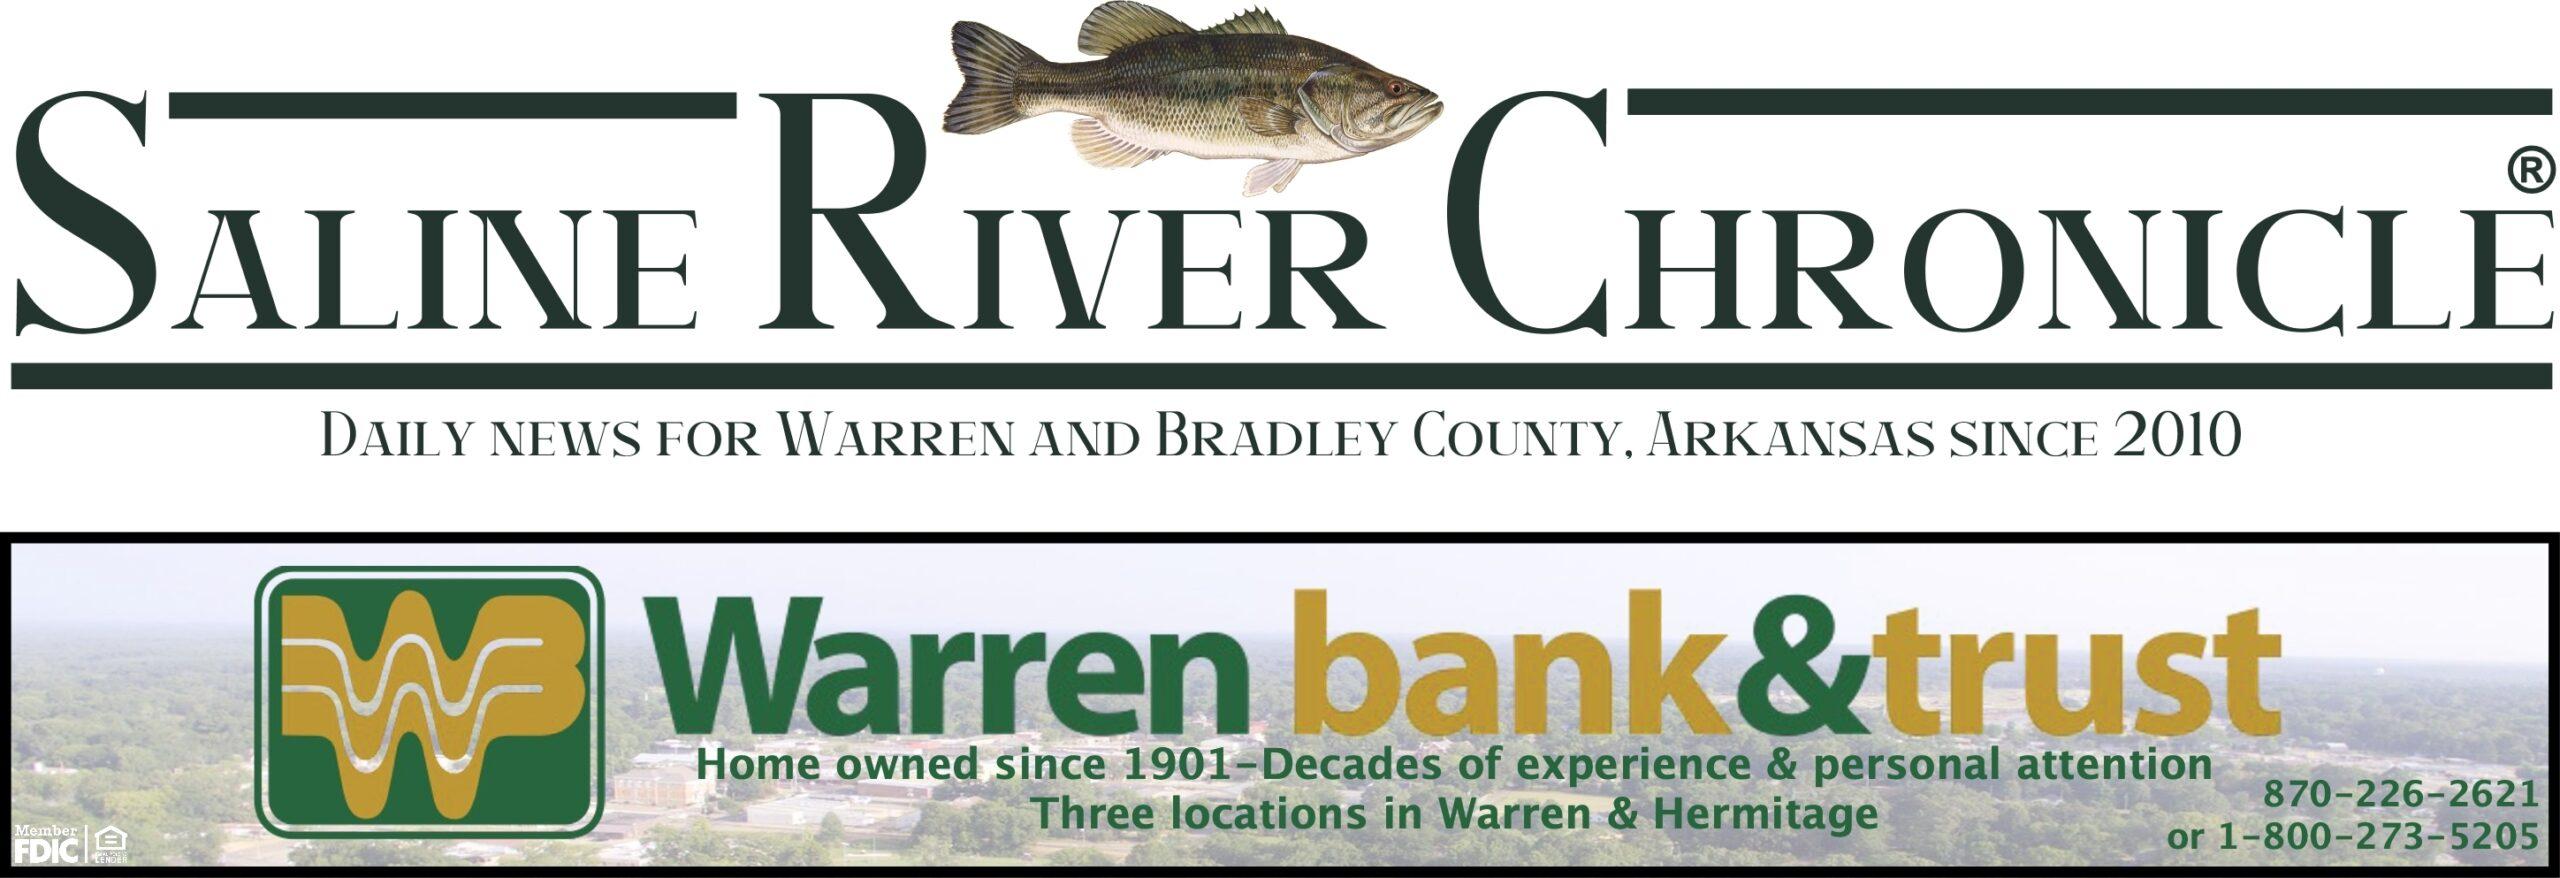 Saline River Chronicle